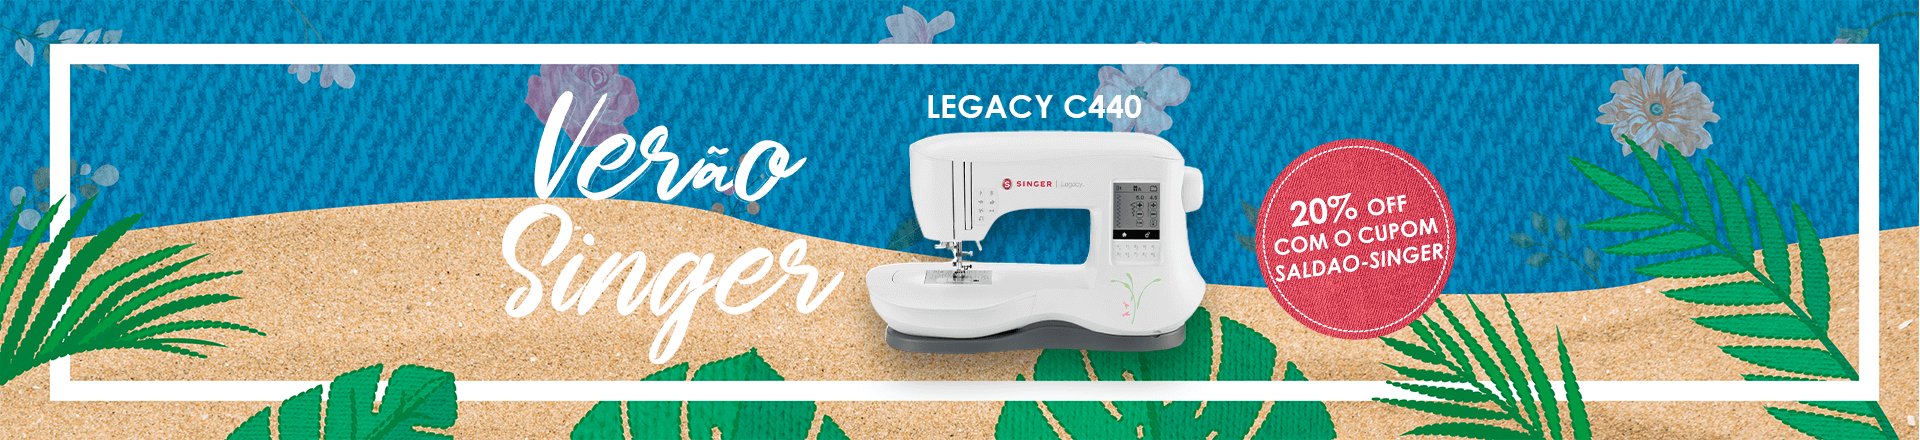 verao legacy c440